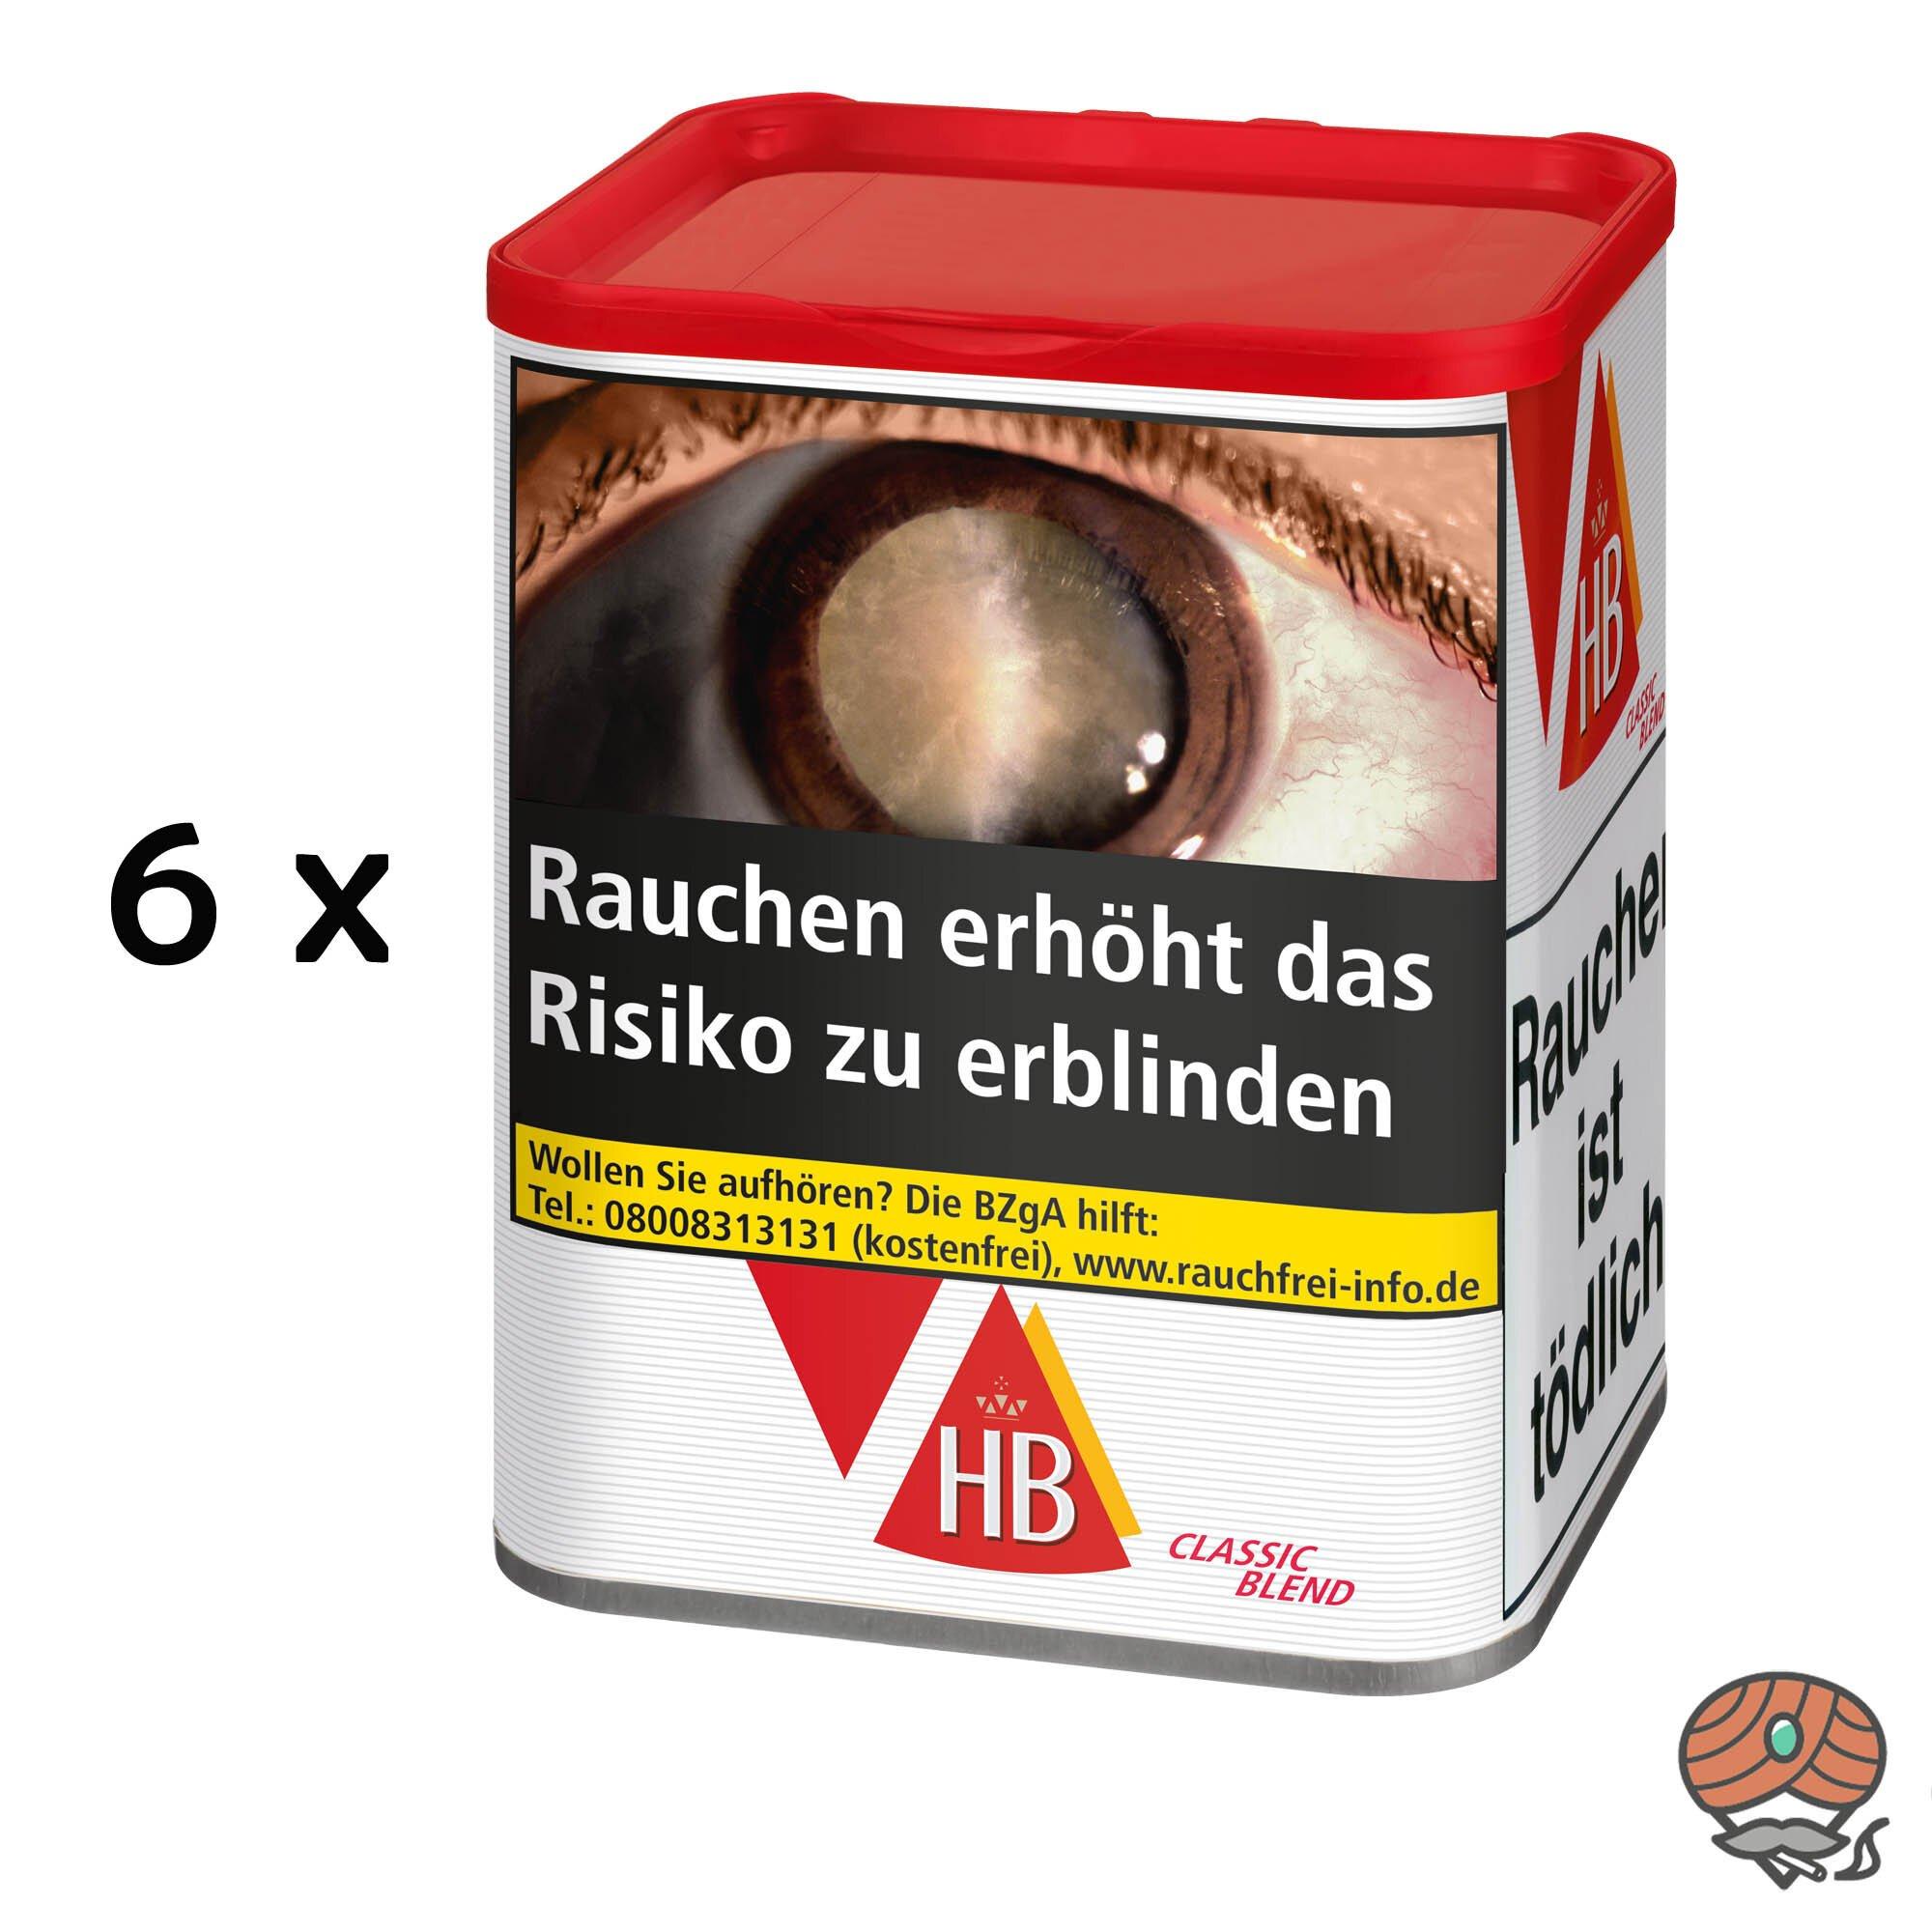 6 x HB Quality Blend / Classic Blend Zigarettentabak 85 g Dose